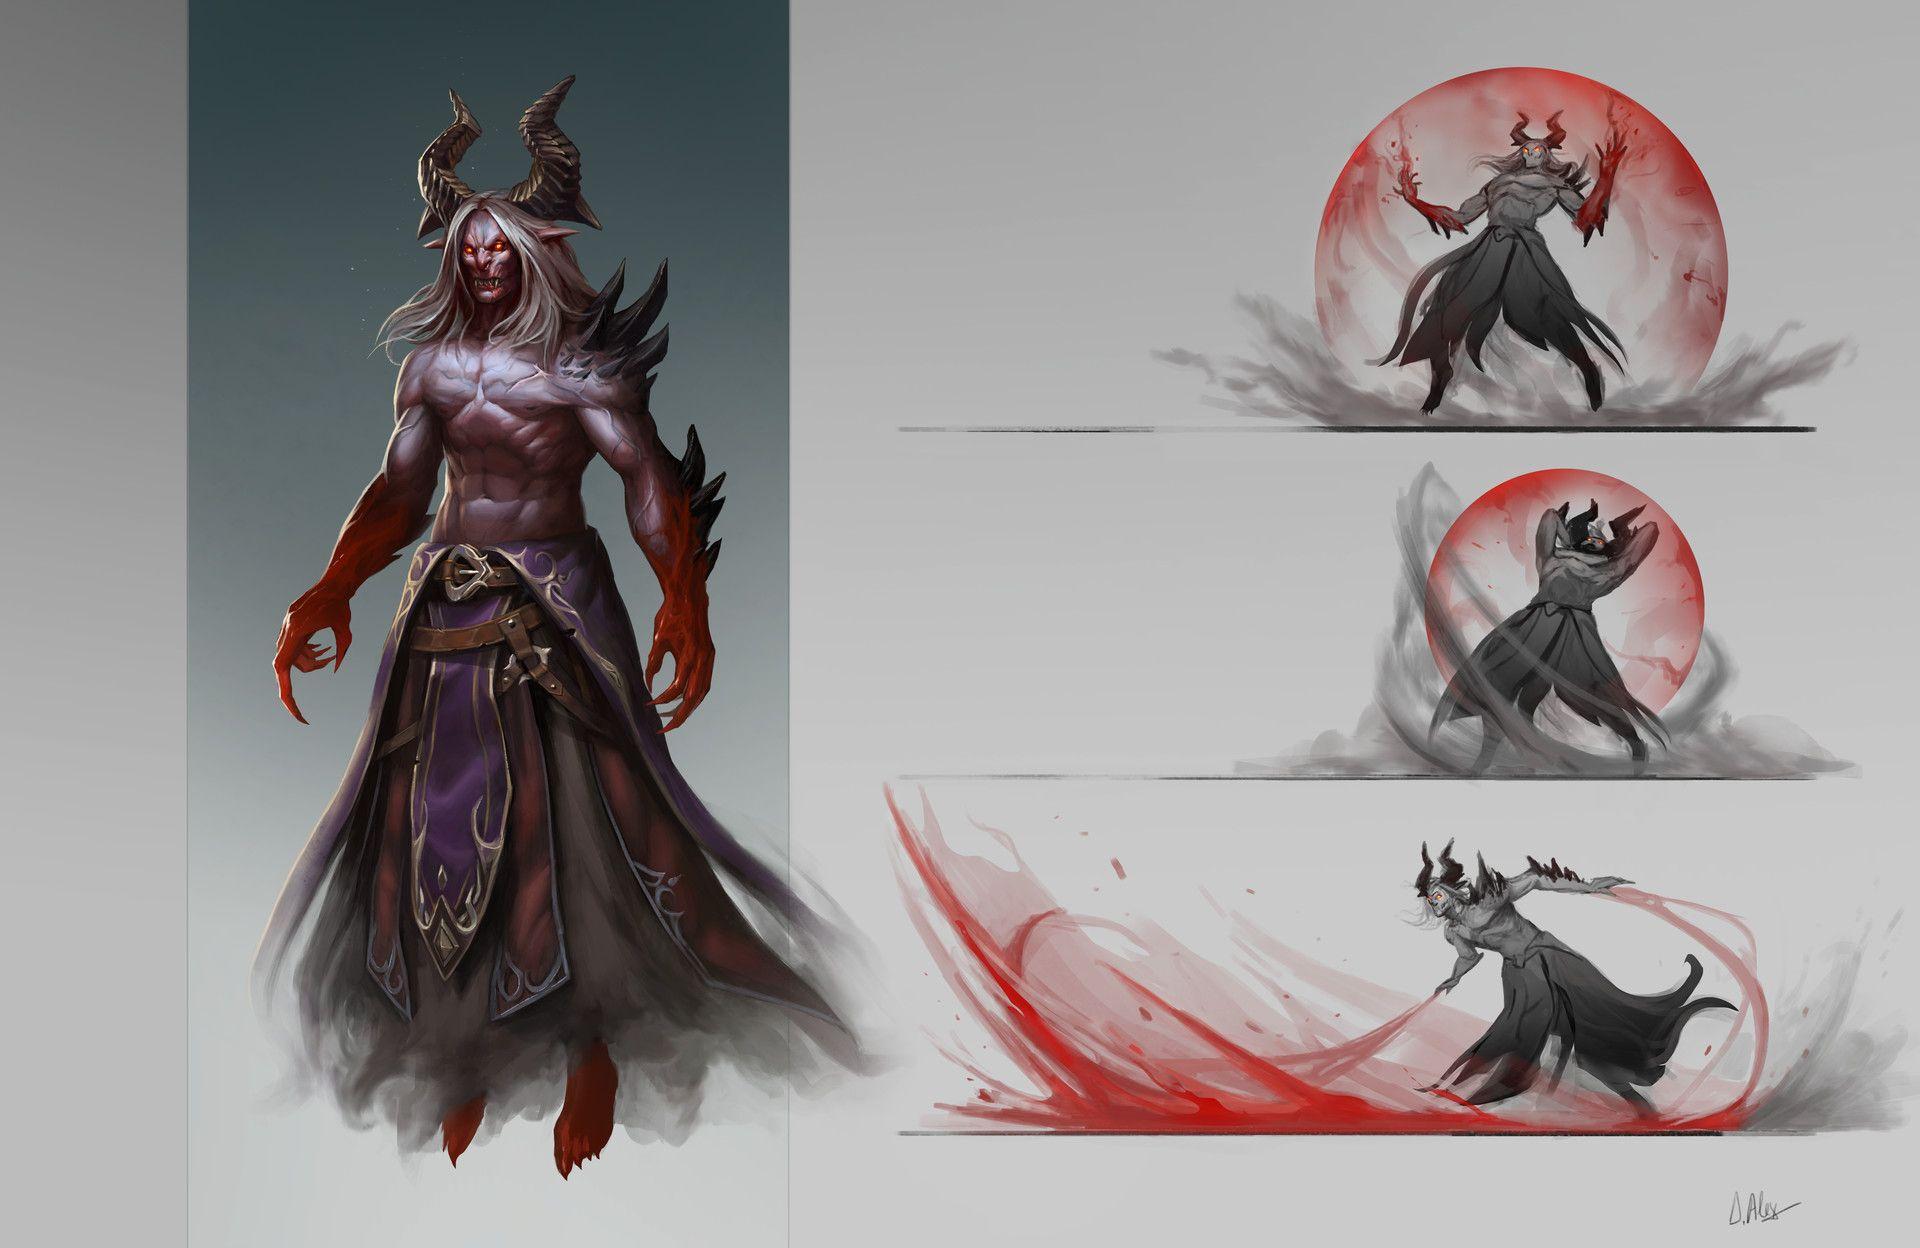 ArtStation - Vampire Demon Concept, Dinulescu Alexandru